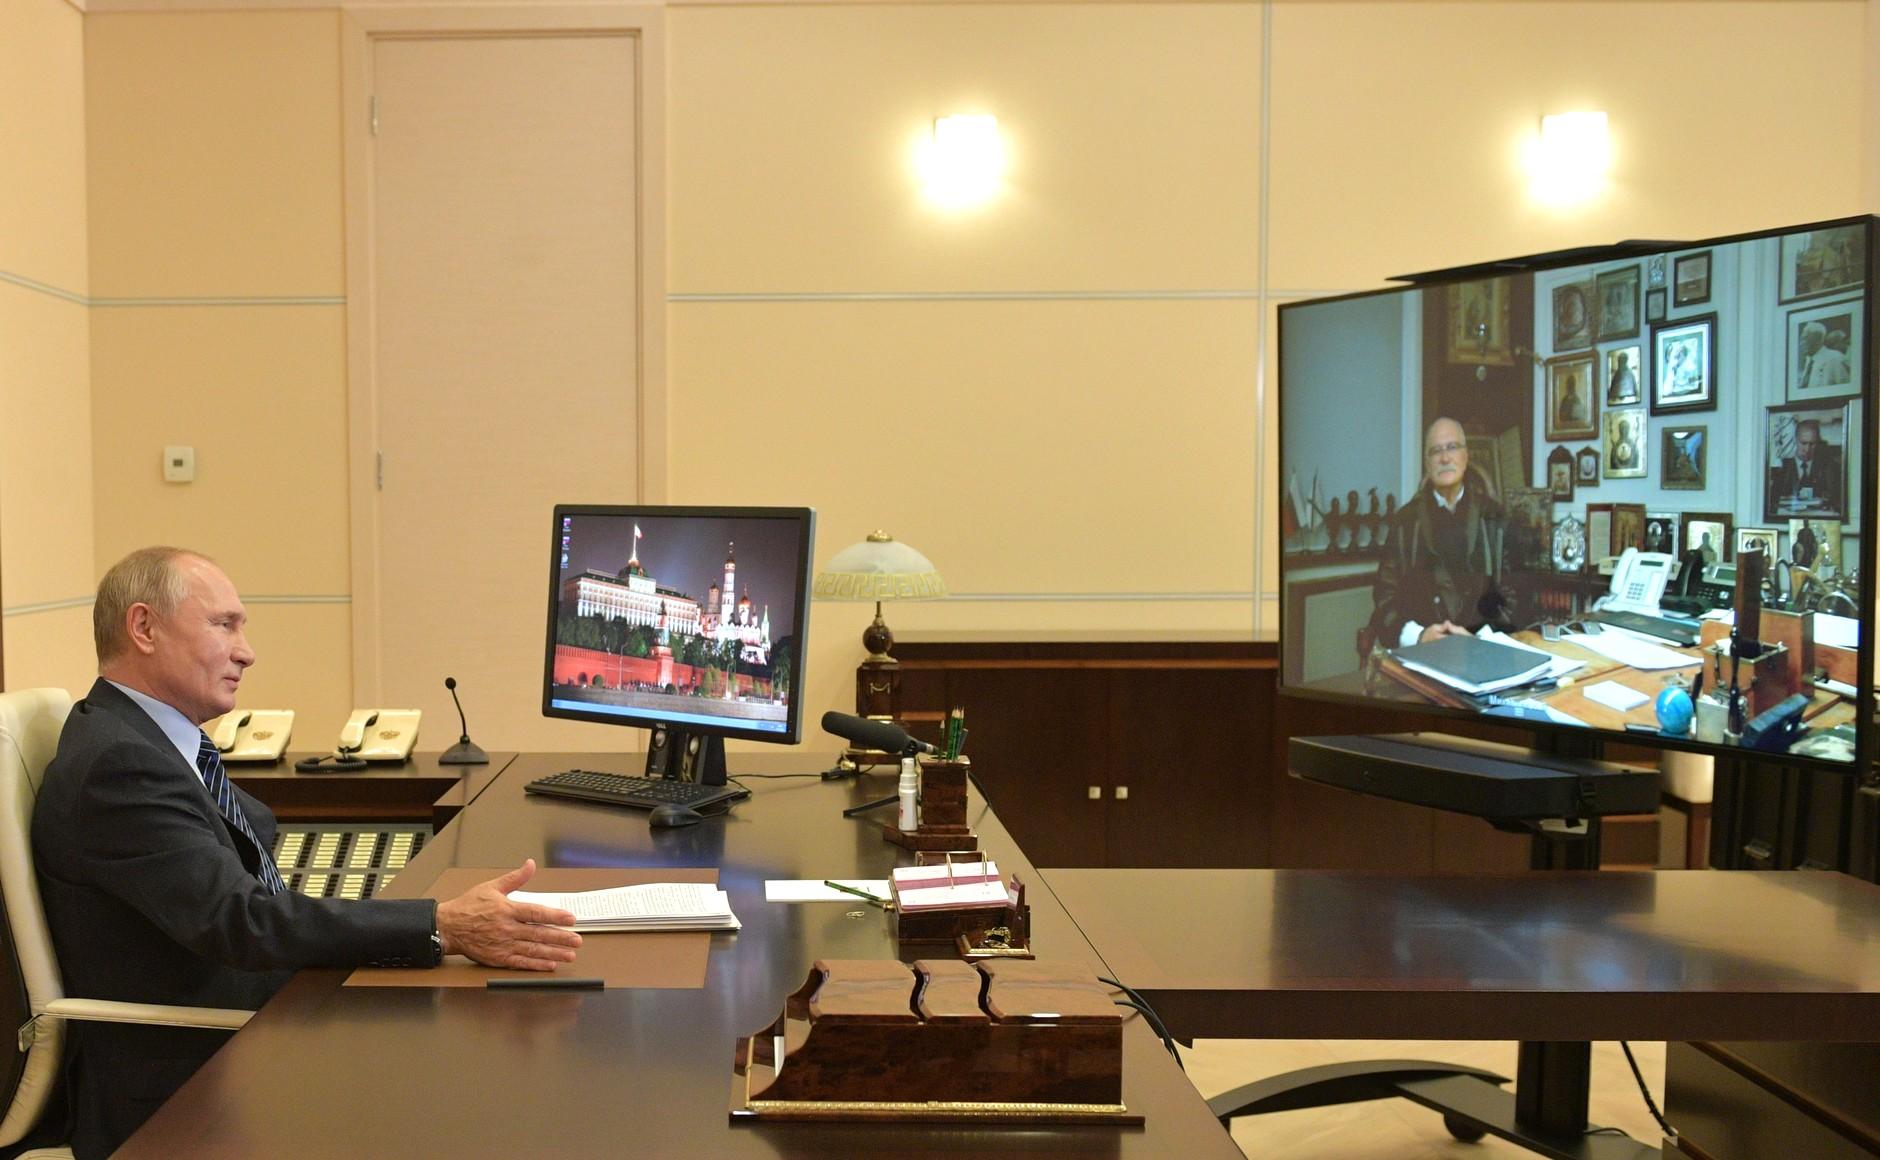 kremlin PH 1 SUR 3 DU 21.10.2020 Rencontre avec Nikita Mikhalkov (par visioconférence).